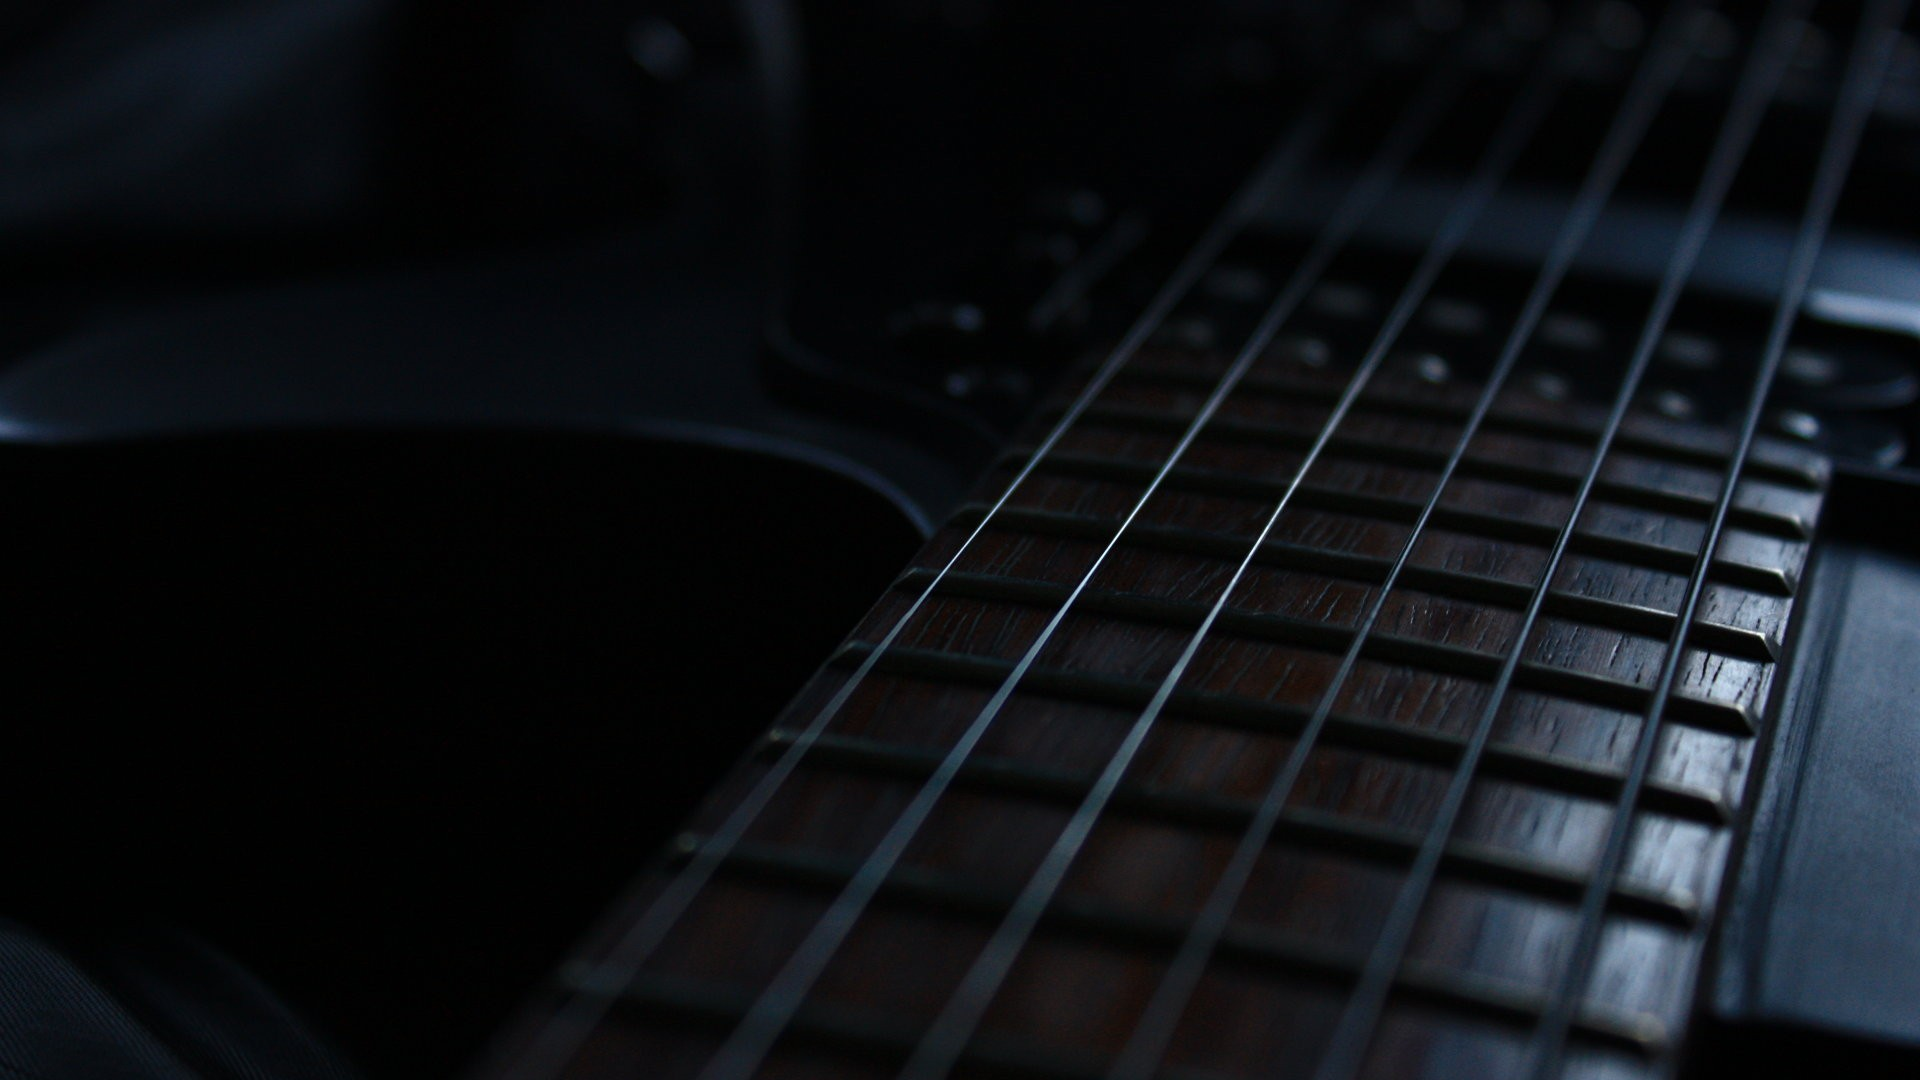 Name Live Wallpaper 3d Guitar Strings Wallpaper 58788 1920x1080 Px Hdwallsource Com